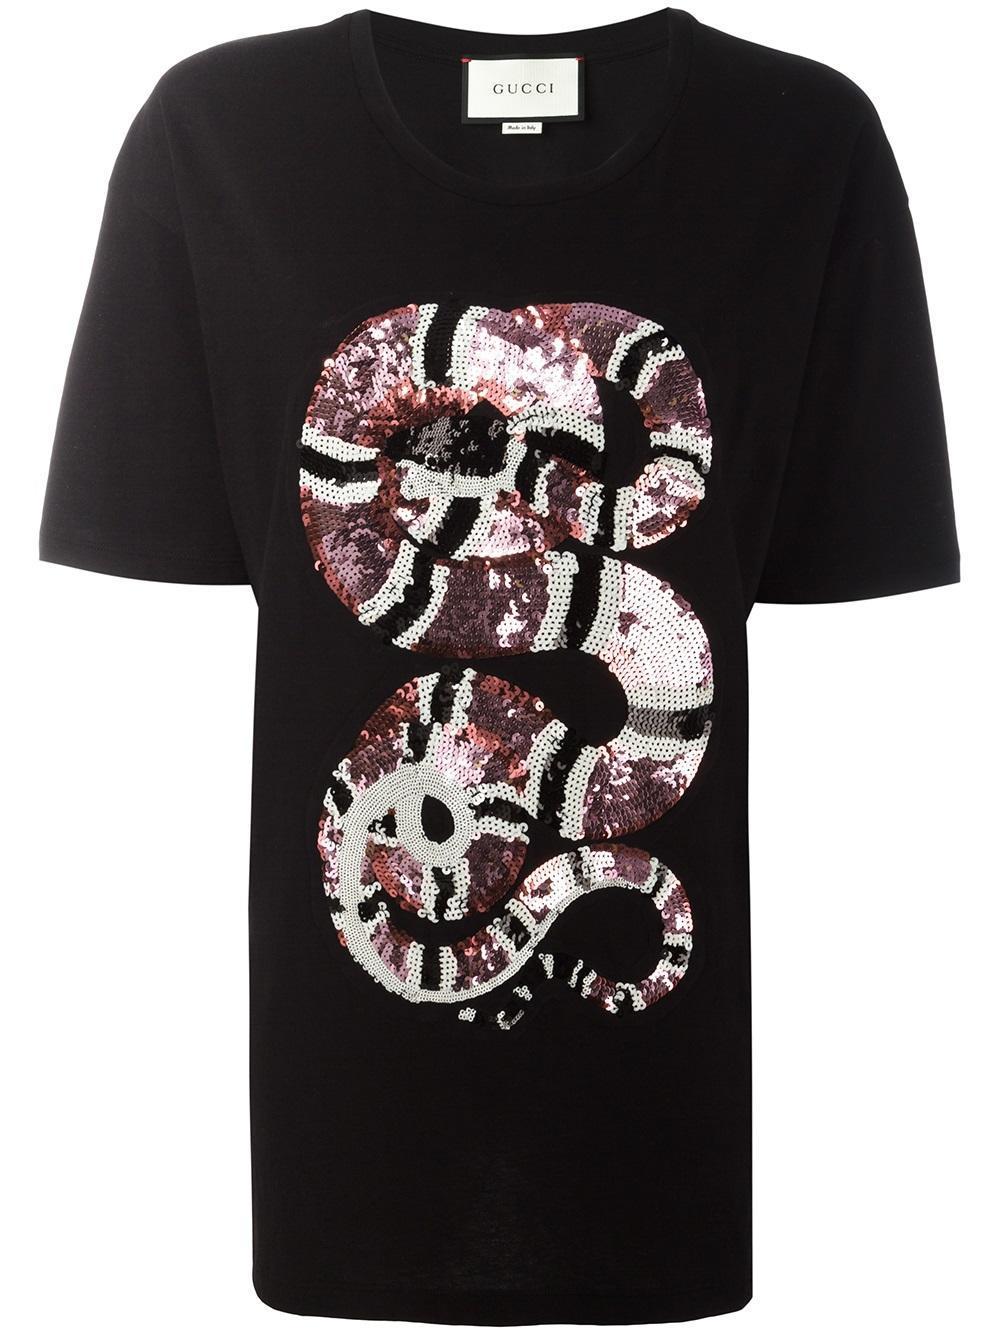 Lyst Gucci Snake Sequin Embellished T Shirt In Black